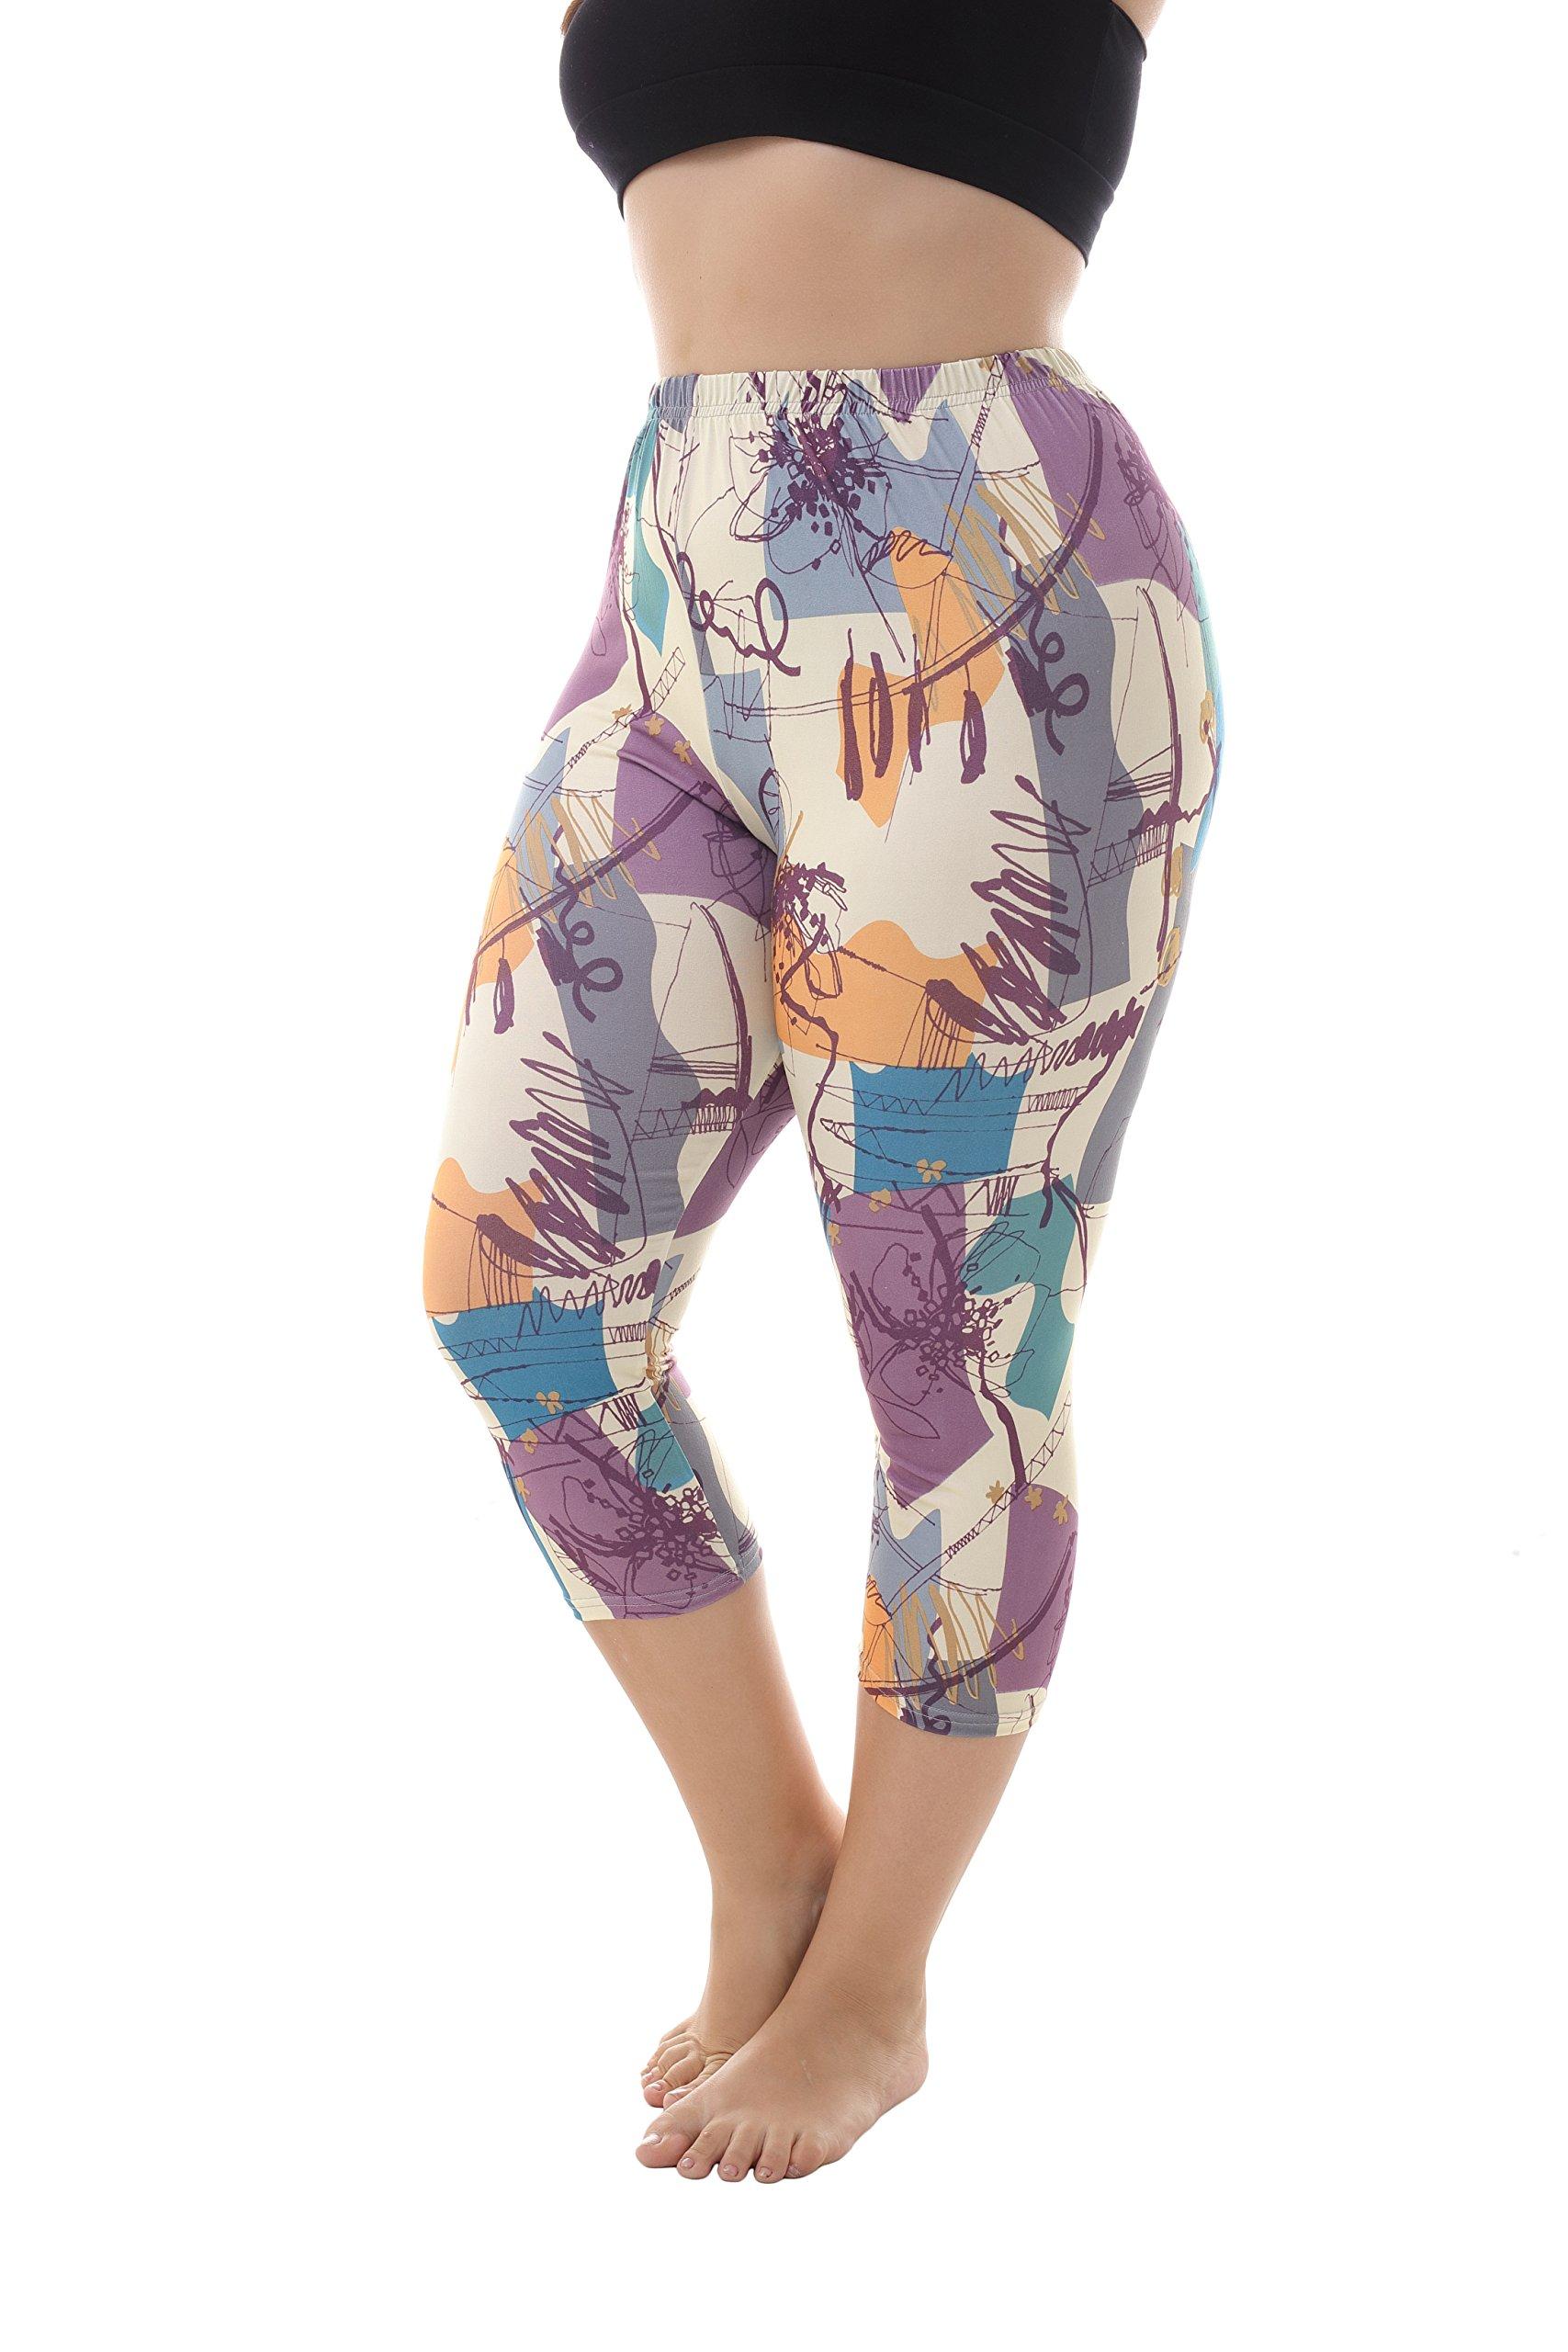 ZERDOCEAN Women's Plus Size Lightweight Printed Capri Leggings style-803 1X